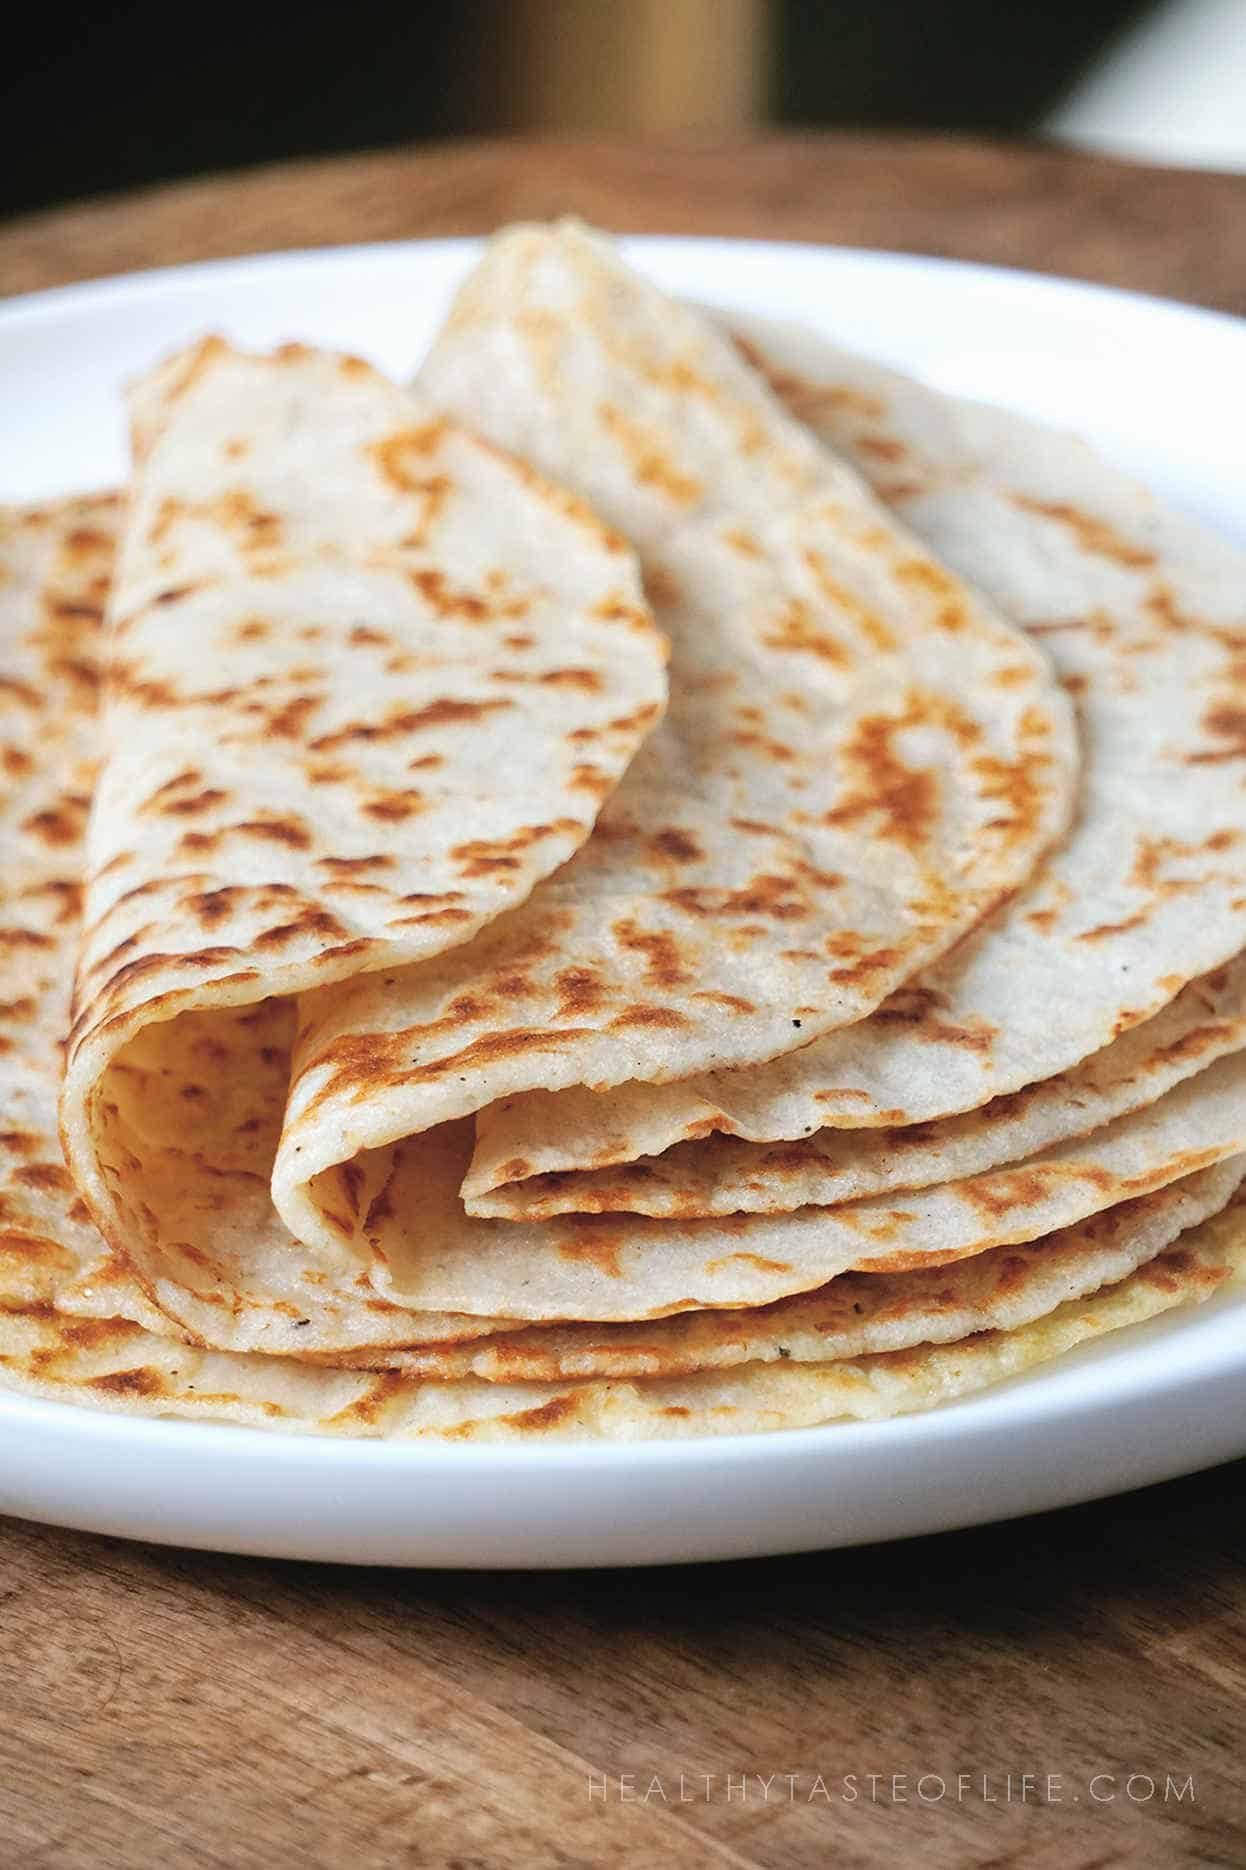 Healthy Vegan Gluten Free Tortillas Wraps